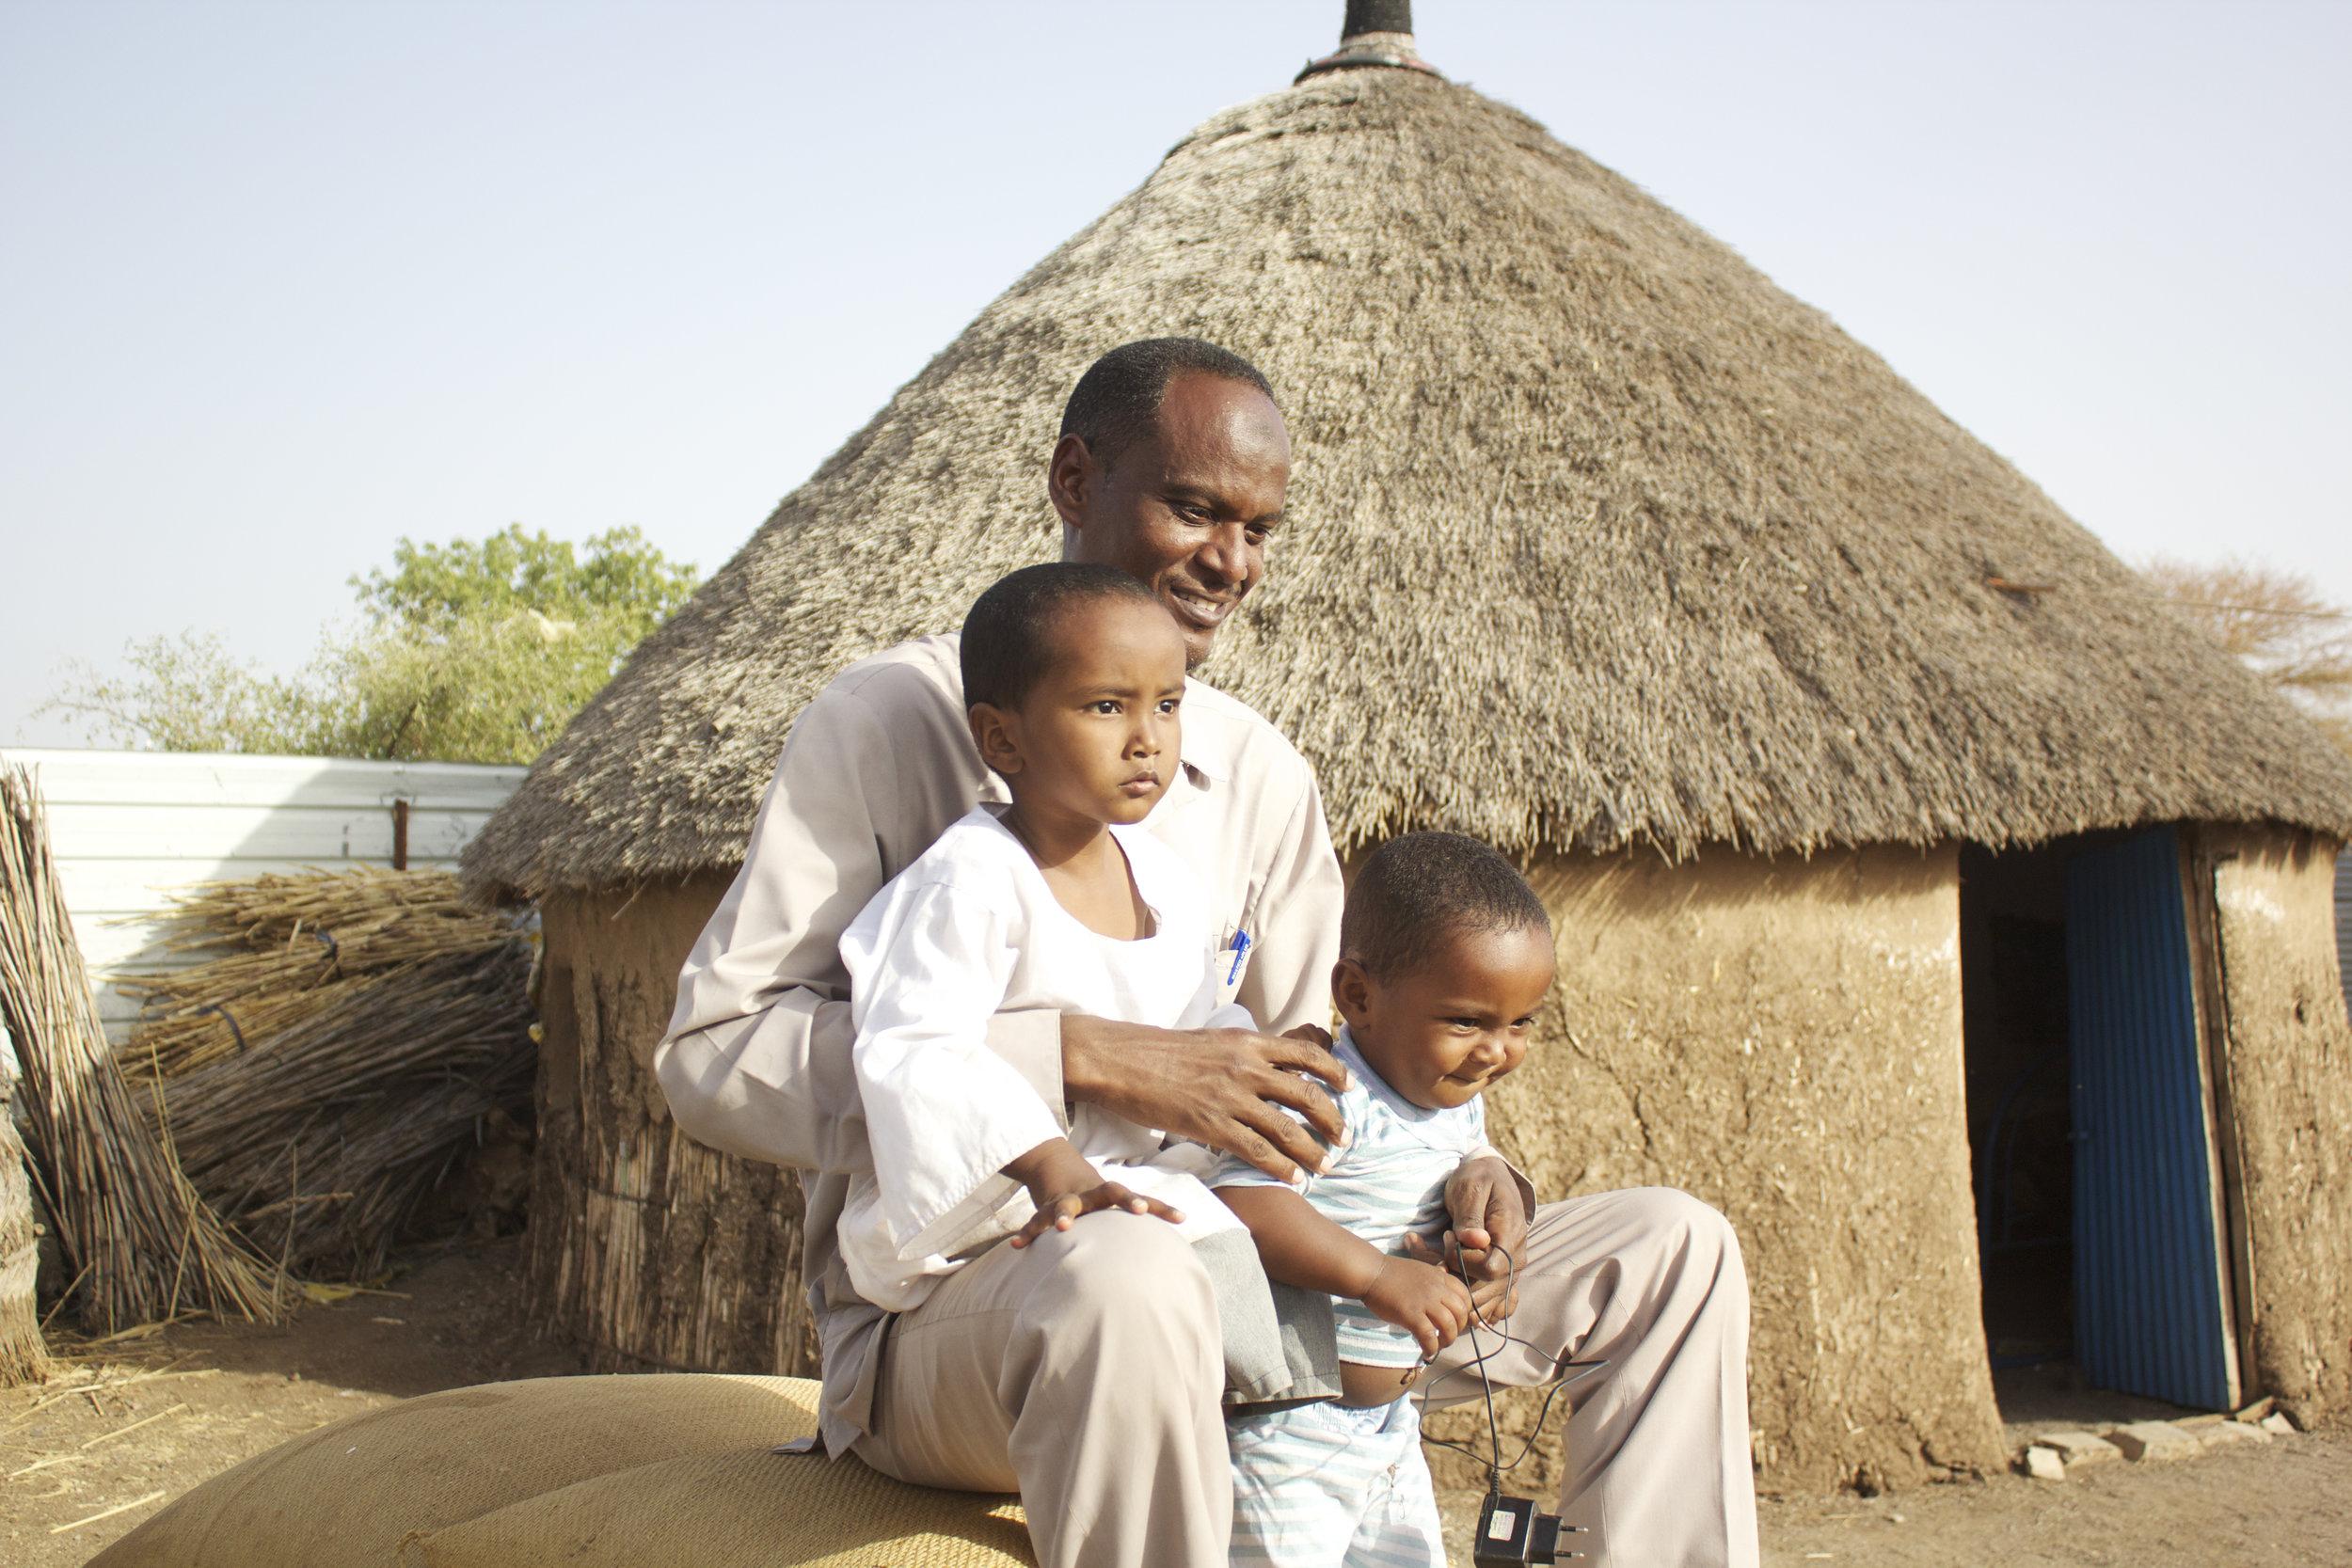 Farmer 40 years old ZOA/Zenab Um Sinebra village, Central Gedaref locality, Gedaref State